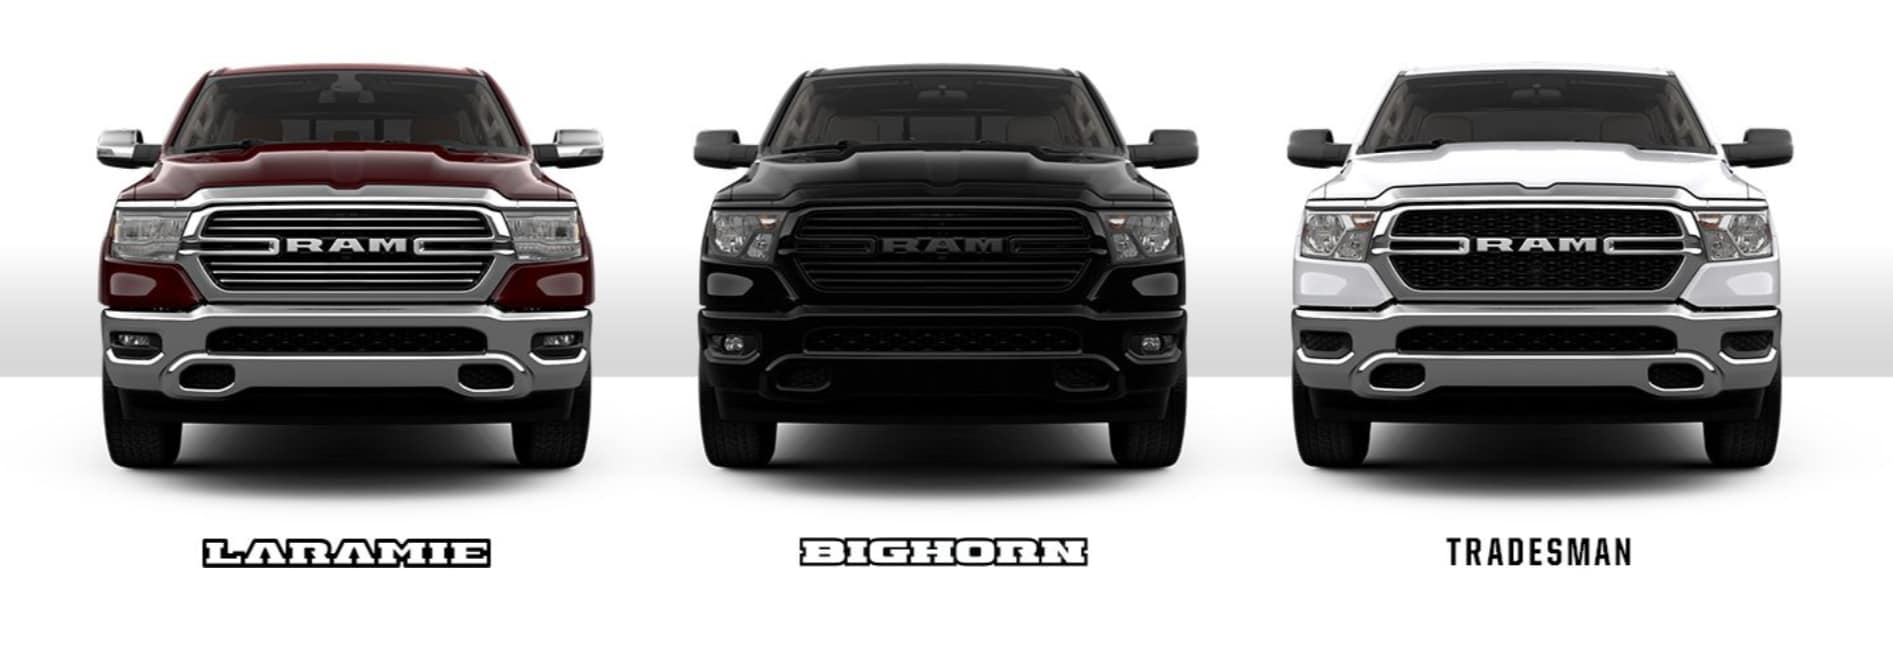 romeo alfa unique fiat mitsubishi dealerships best in kia of dodge buick latest gmc dealers ma ideas car and jeep chrysler